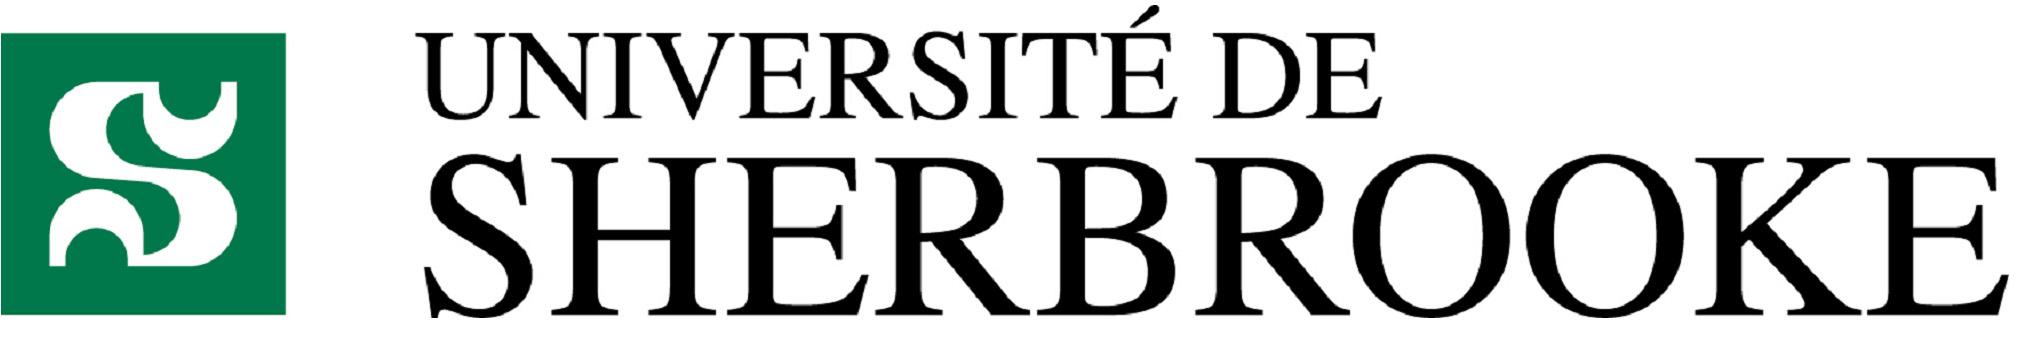 logo_UdeS.jpg